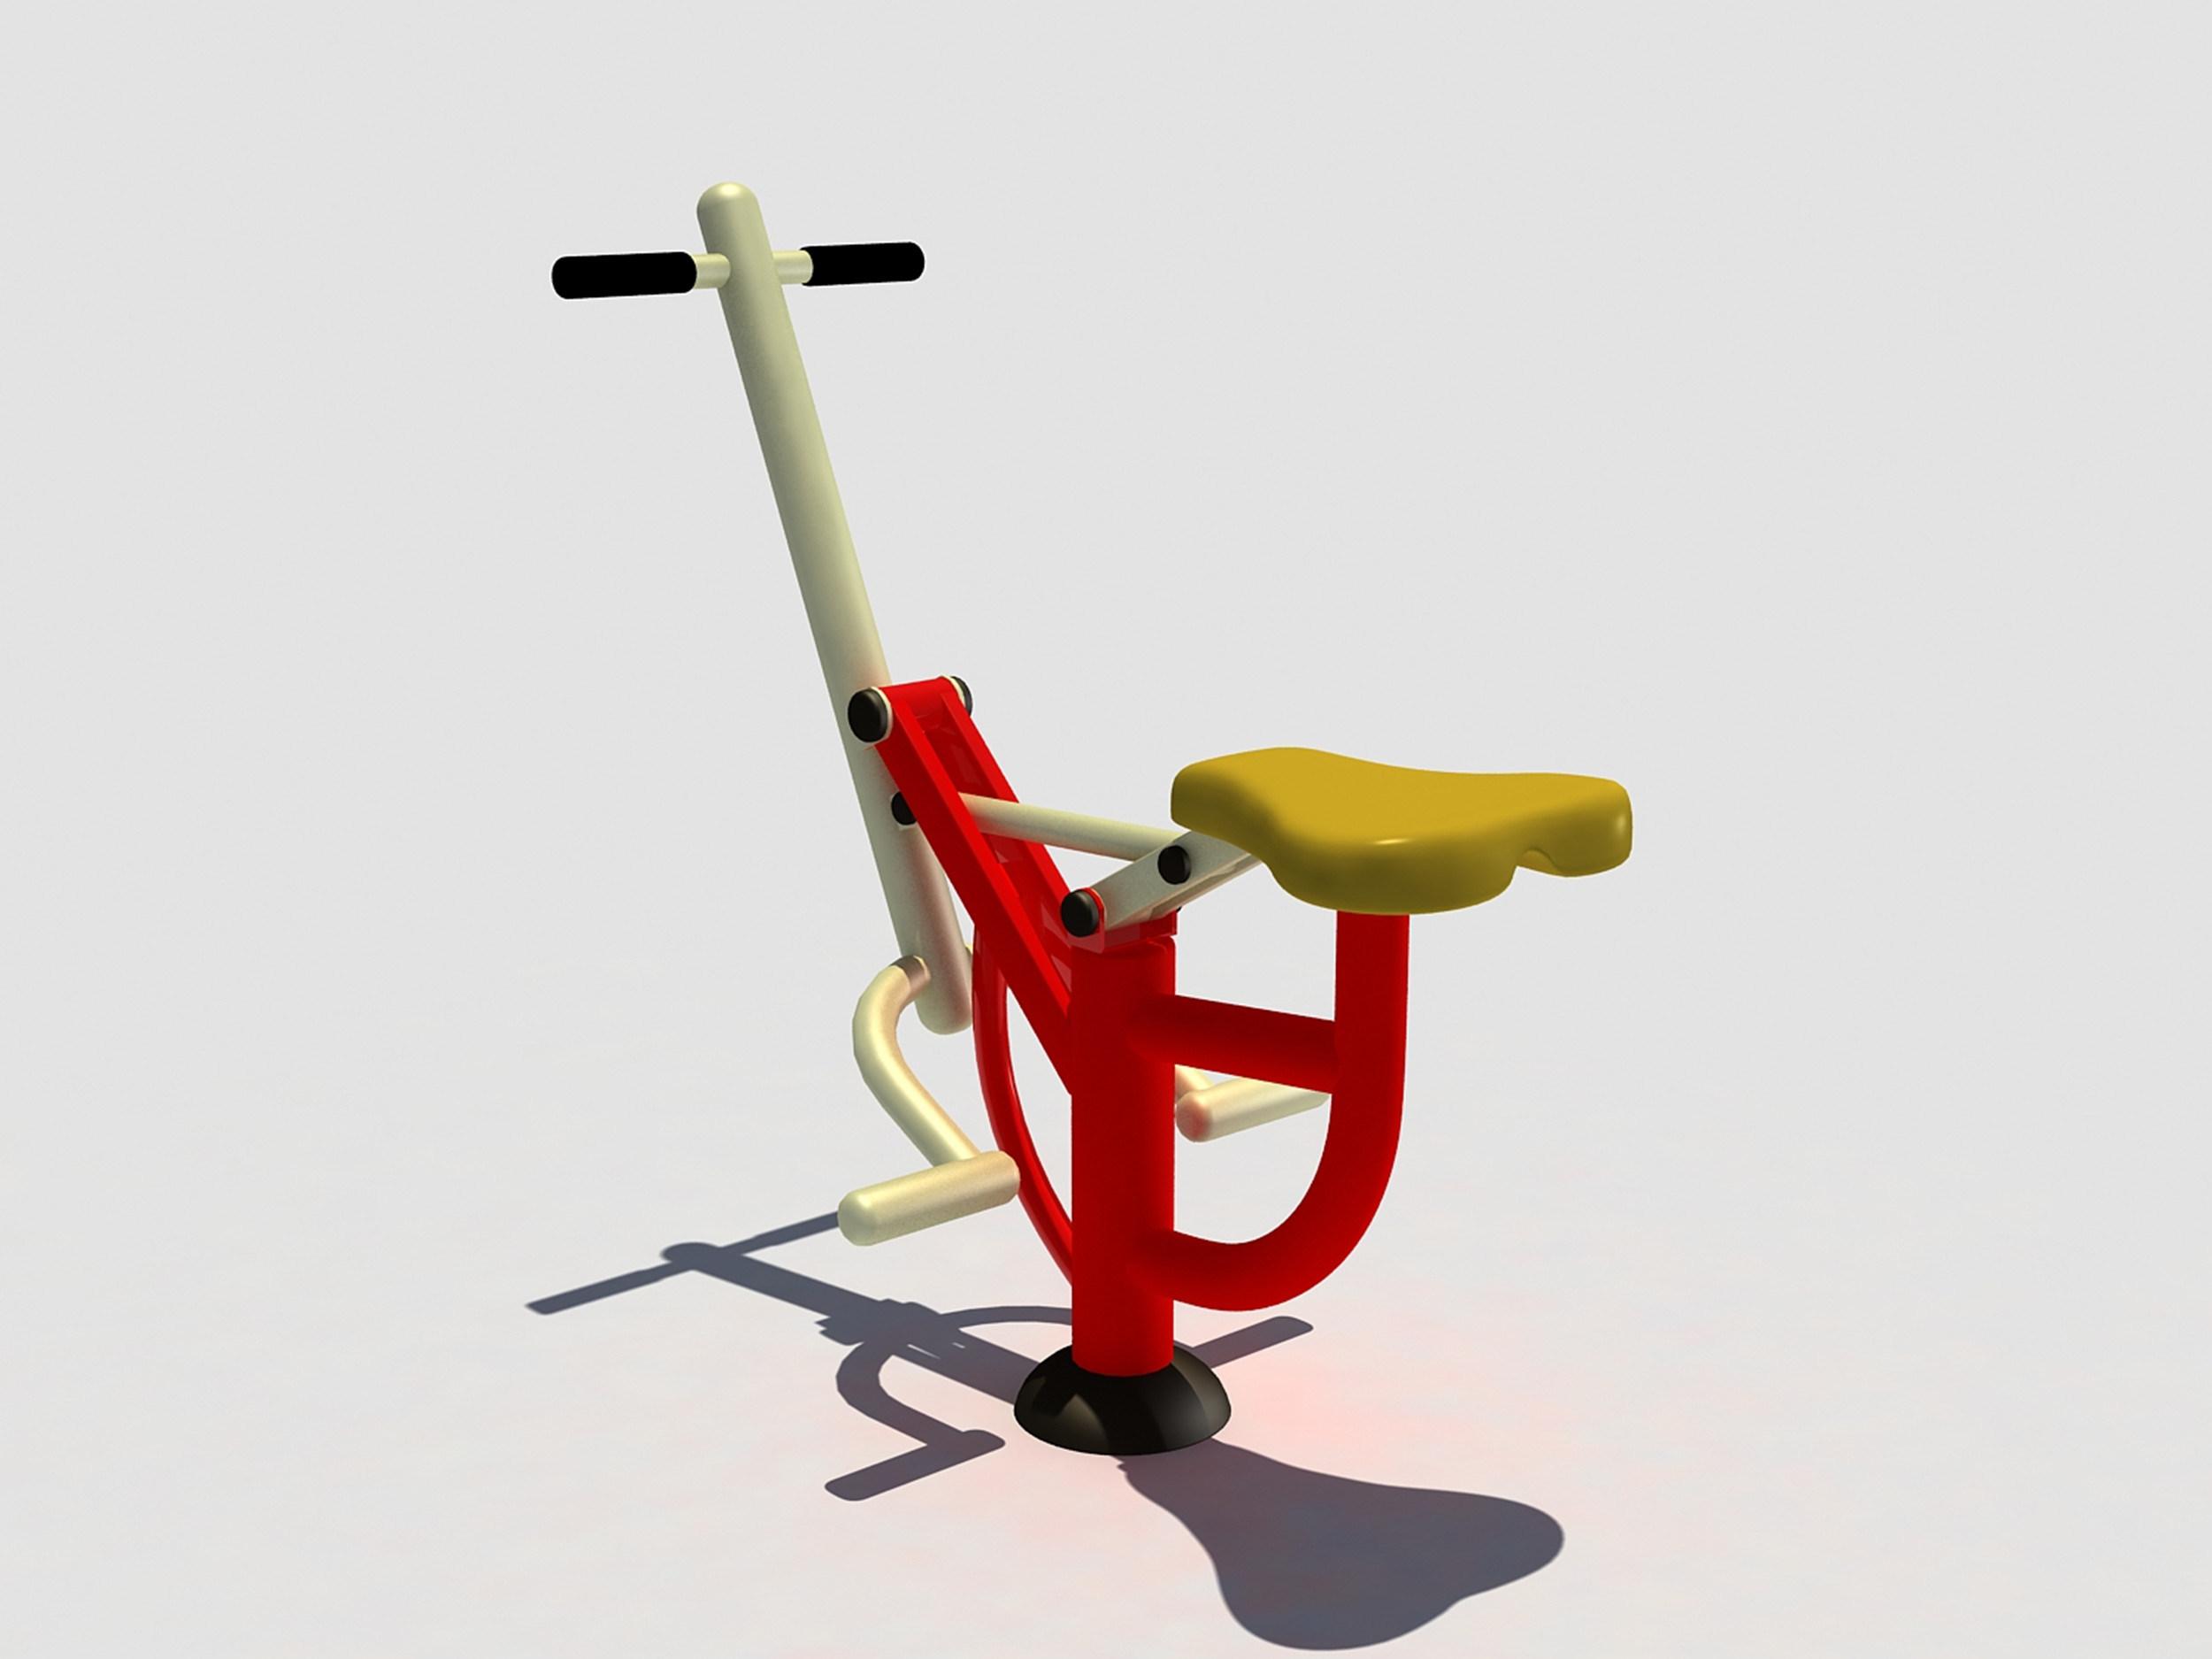 Best Sale Elliptical Trainer Outdoor Fitness Equipment Amusement Park Goods Body Building Equipment FT-Of308